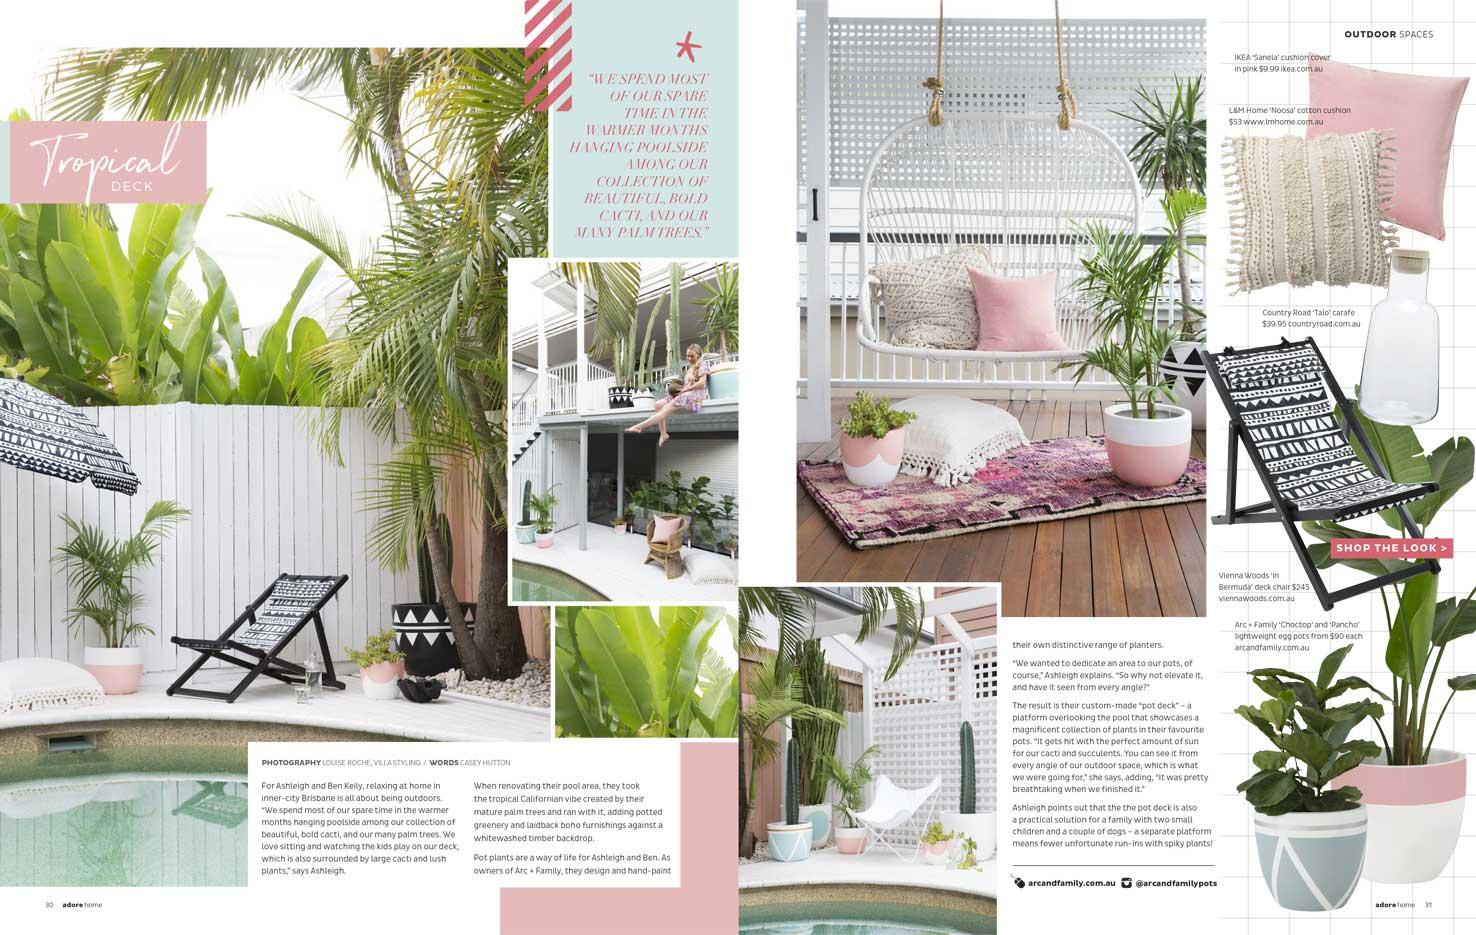 Blog_Lifestyle_AdoreMag17_TropicalDeck_01